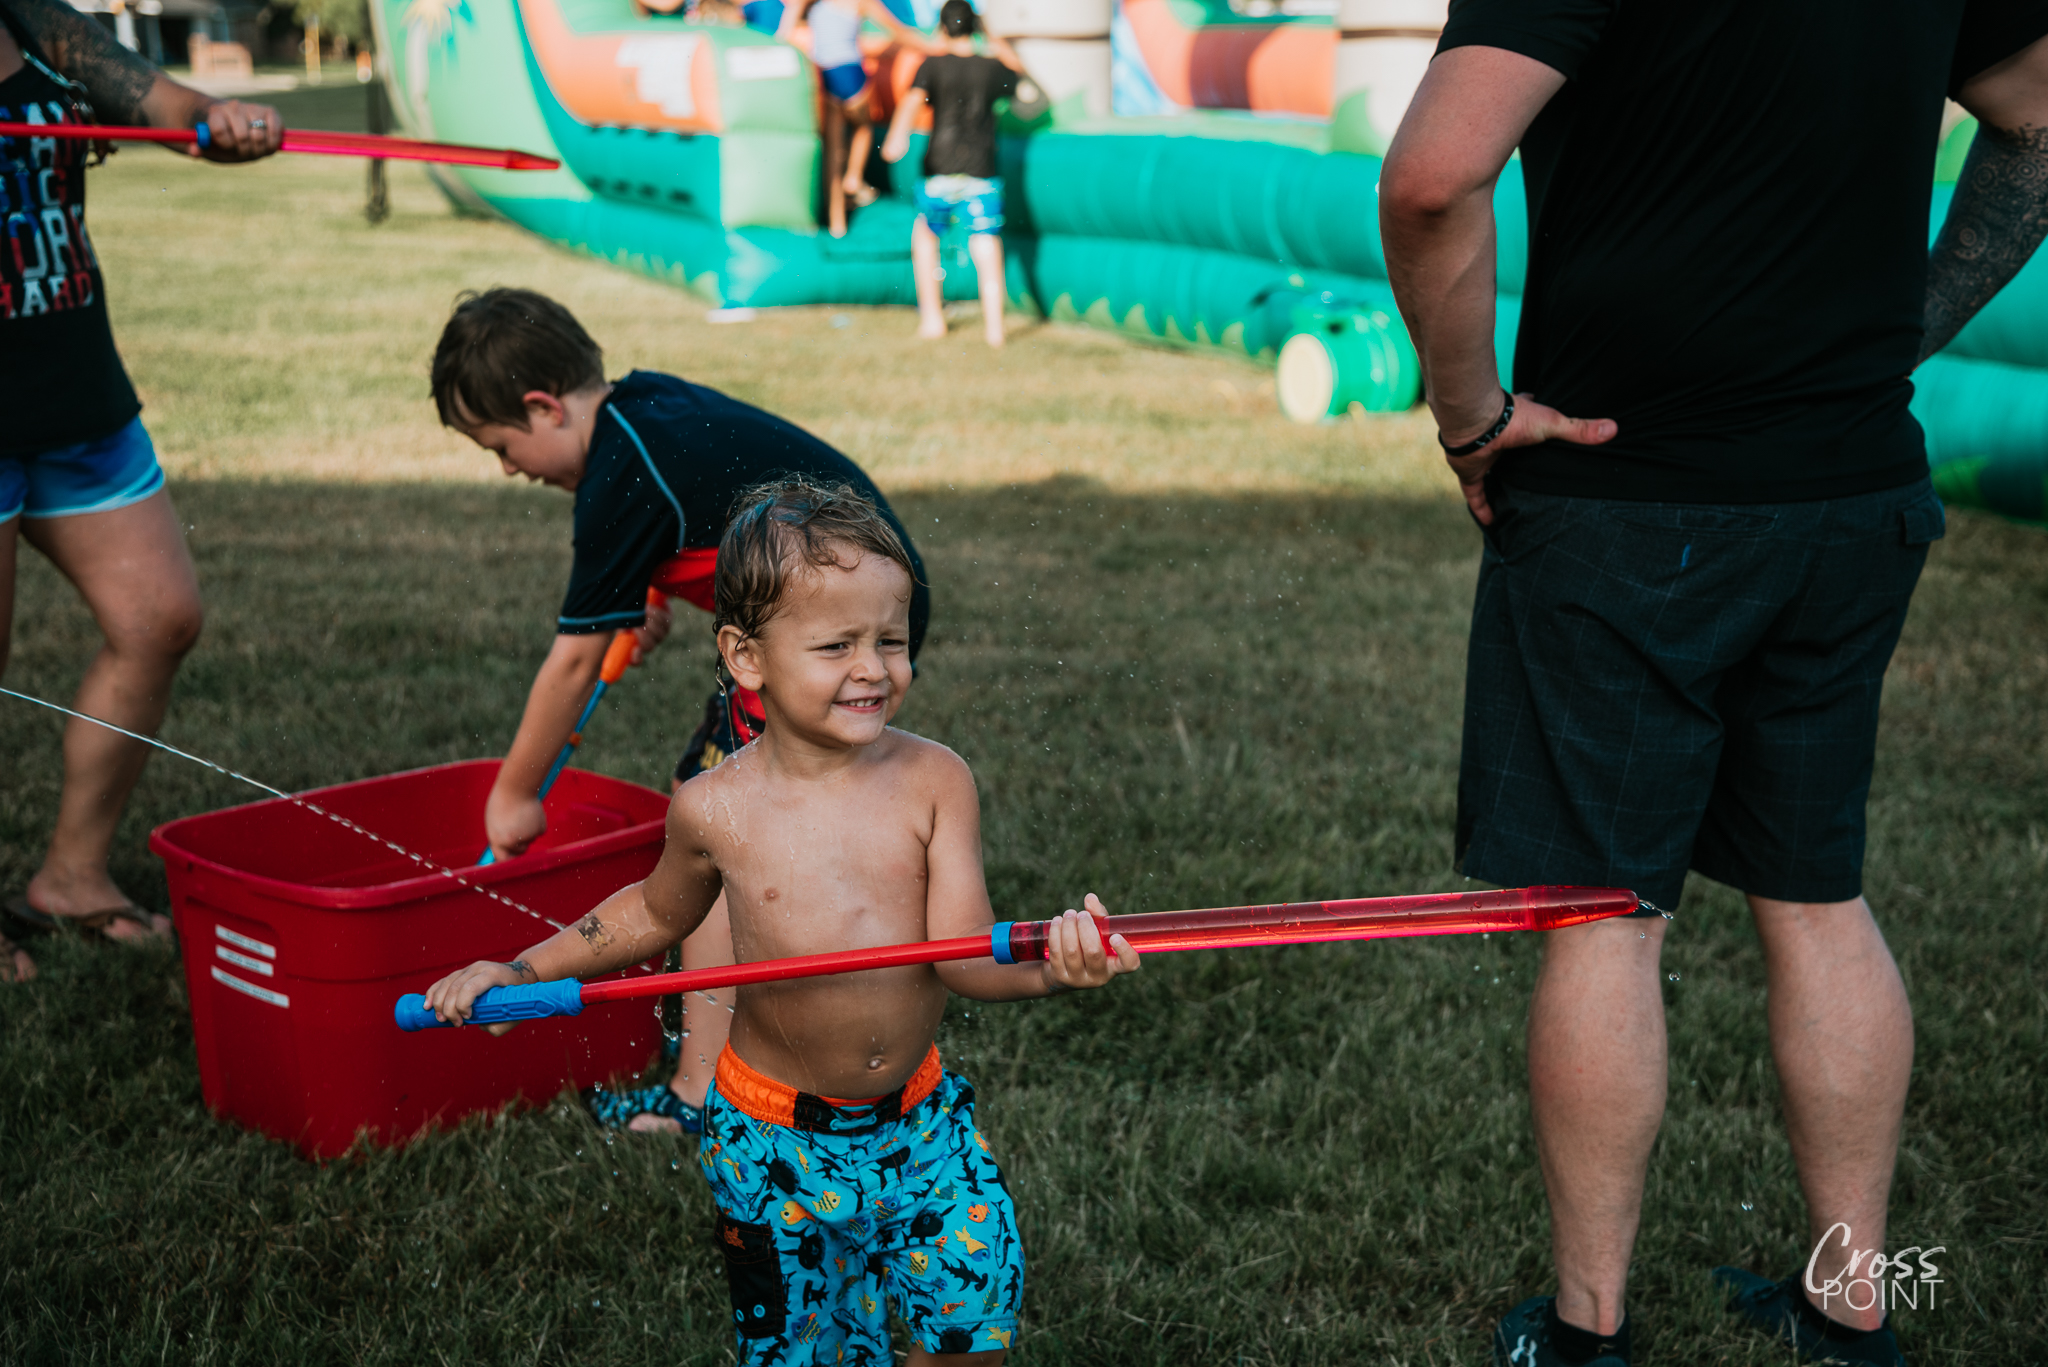 CrossPoint-Water-Famjam-Katy-TX-2018-17.jpg